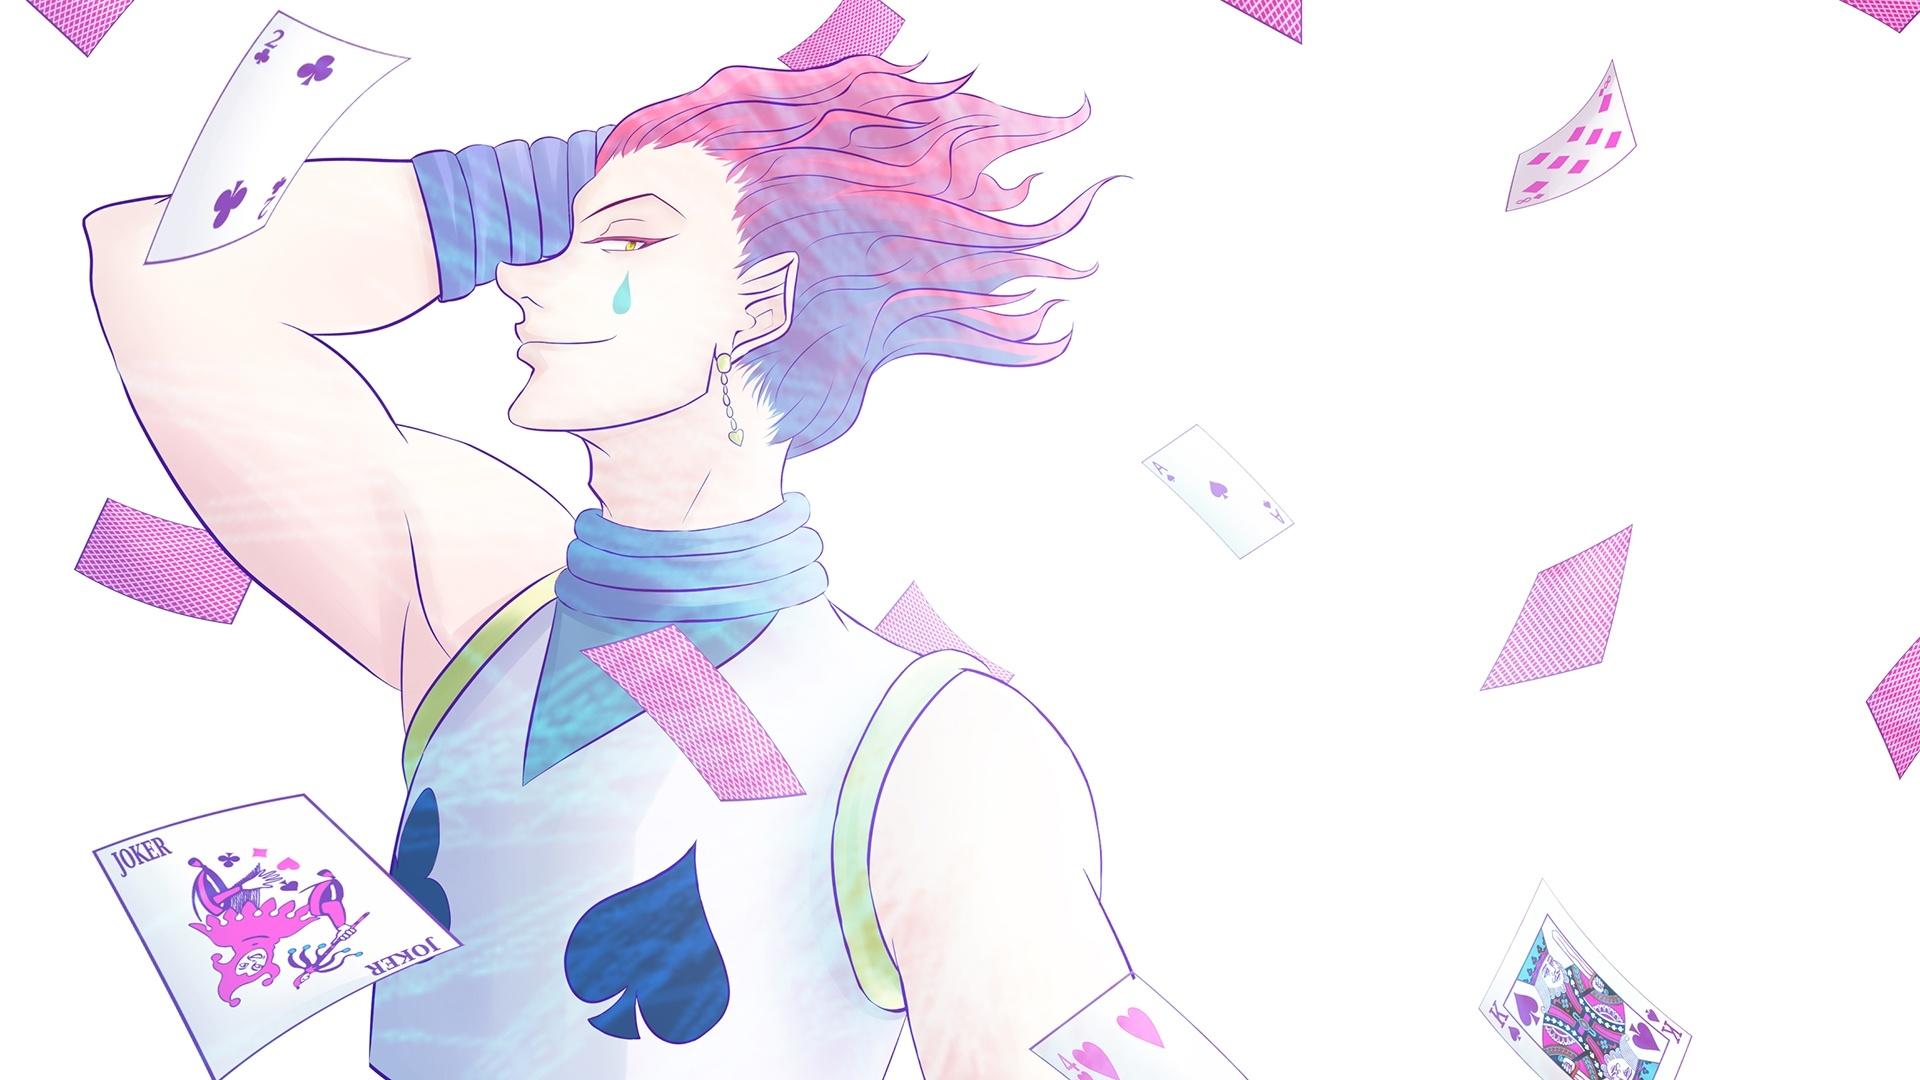 Hisoka free background